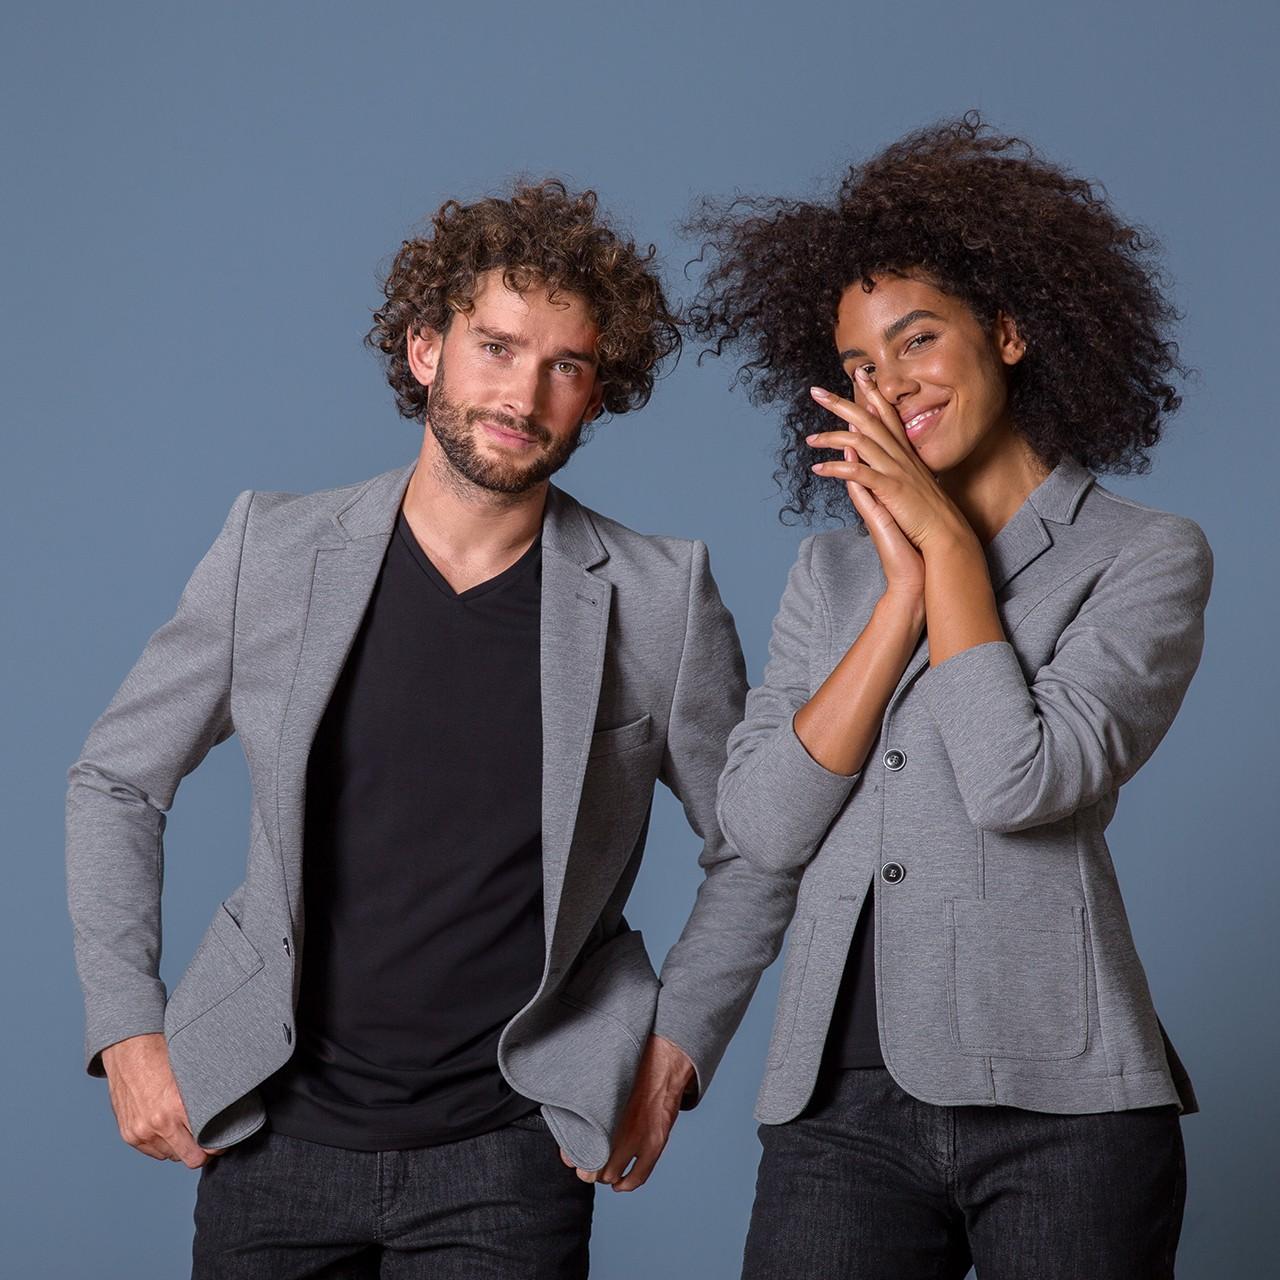 Damen Casual Jerseyblazer Grau Meliert Regular Fit Greiff® | bedrucken, besticken, bedrucken lassen, besticken lassen, mit Logo |